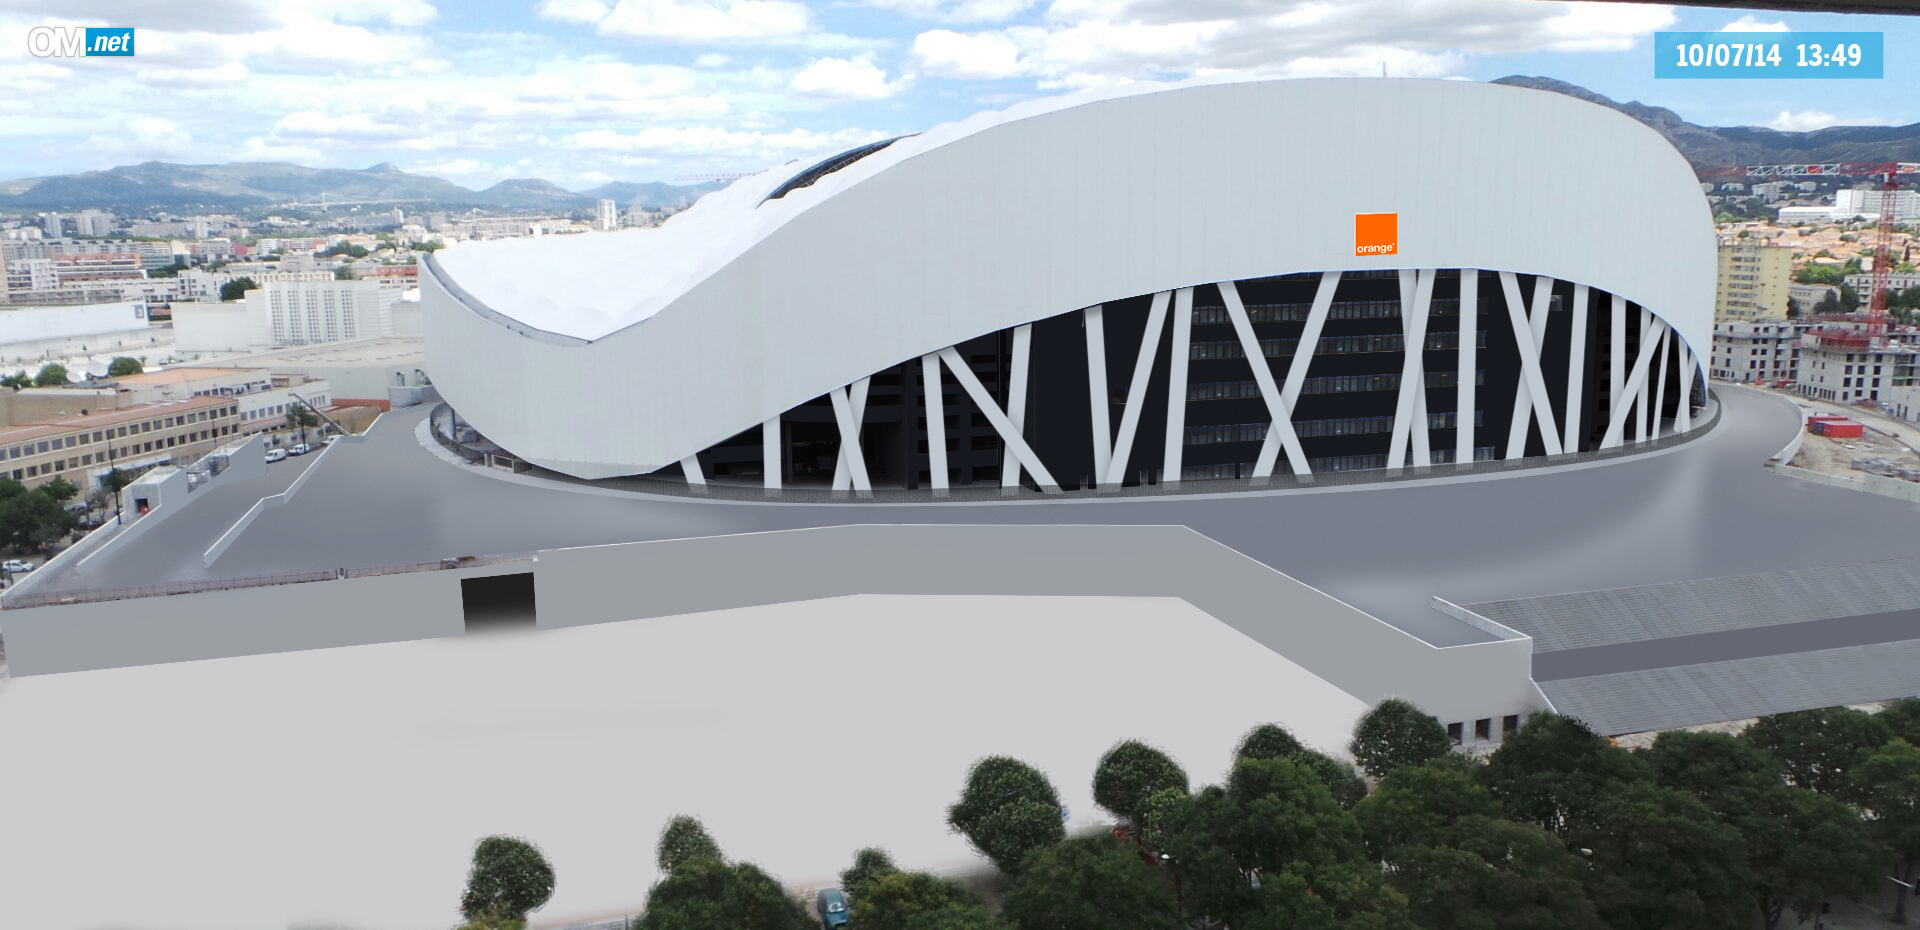 Marseille Stade Orange Vélodrome 67 354 Ligue 1 Page 3637